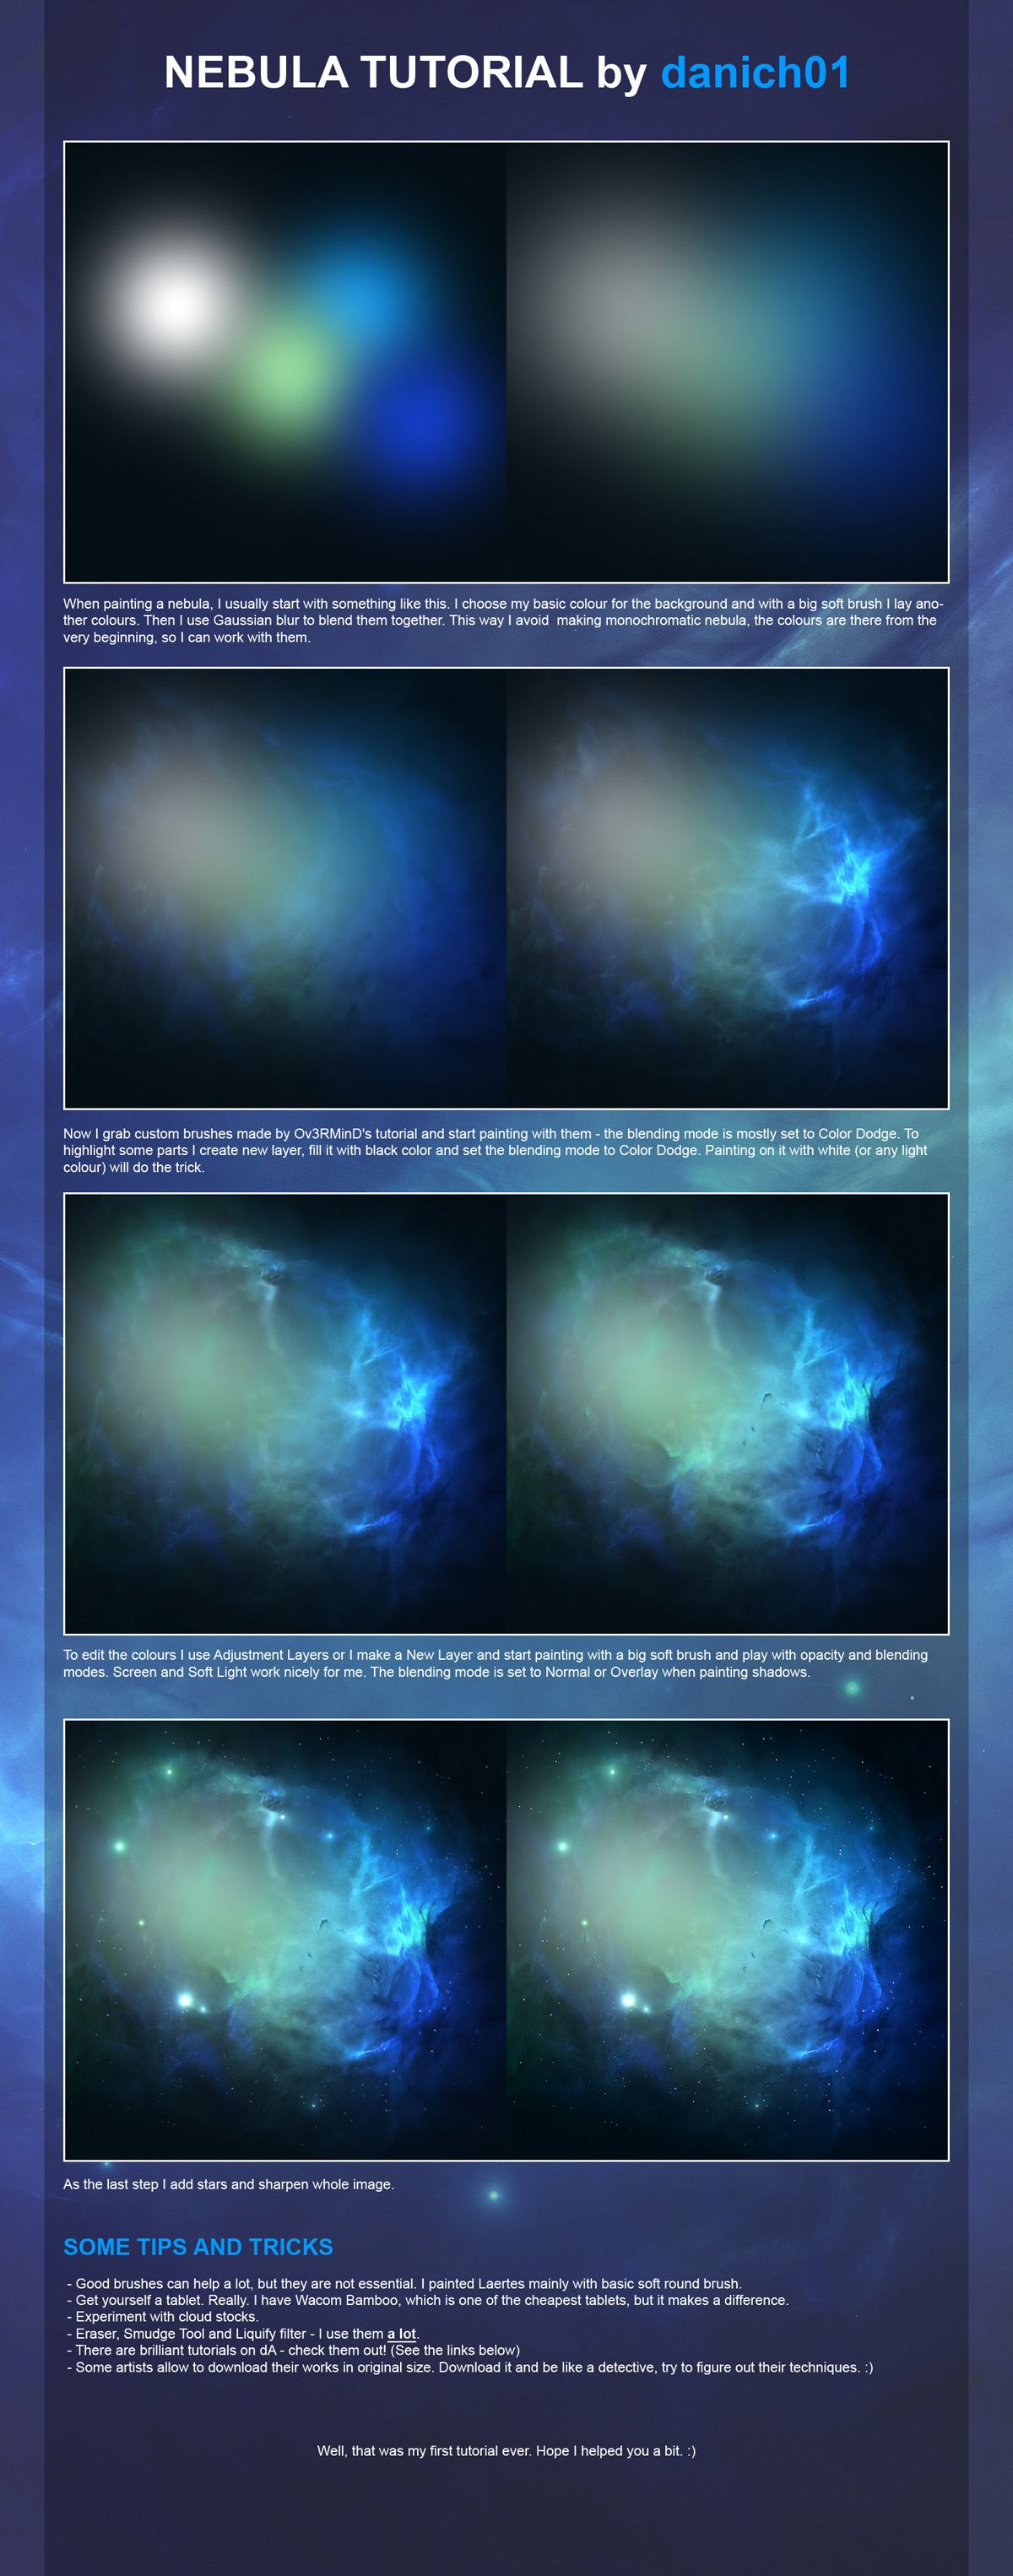 Nebula Tutorial By Danich01 On Deviantart Digital Painting Tutorials Digital Painting Digital Art Tutorial